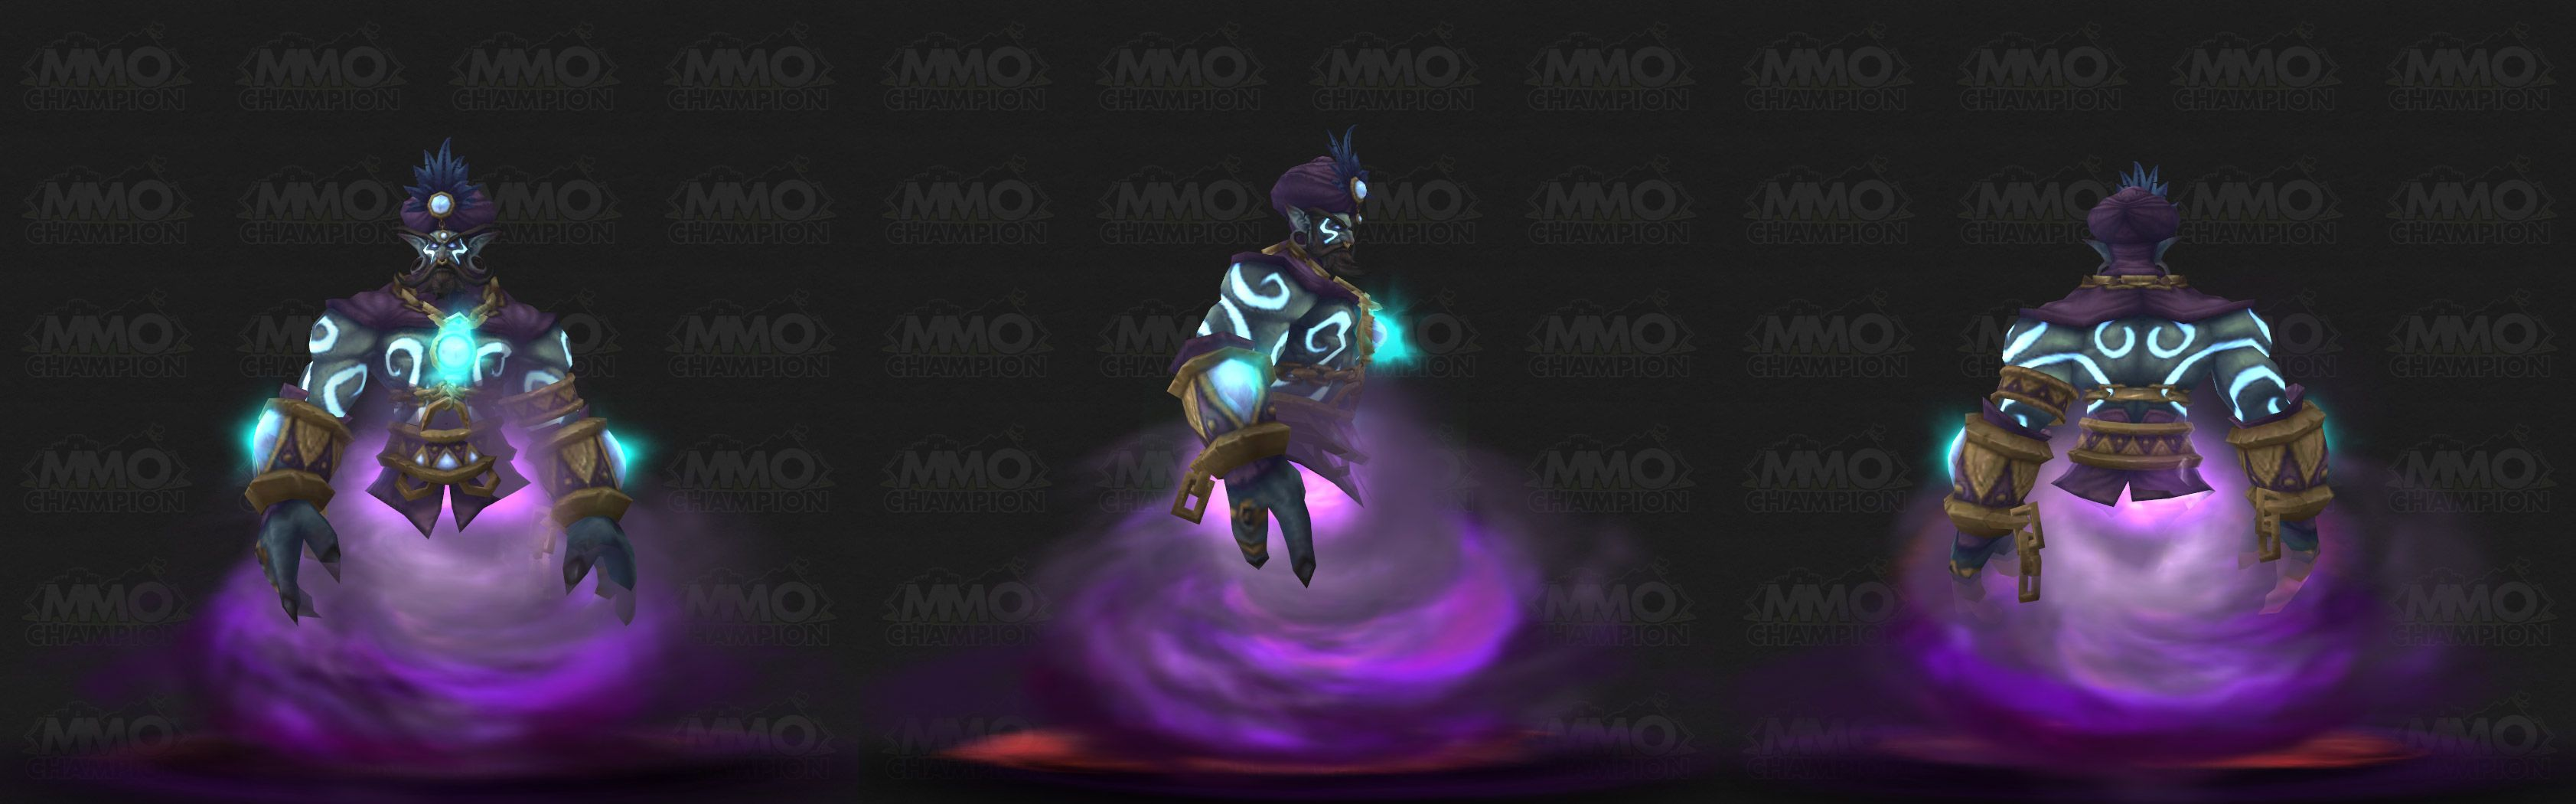 #spirit #magic #character #design #ghost